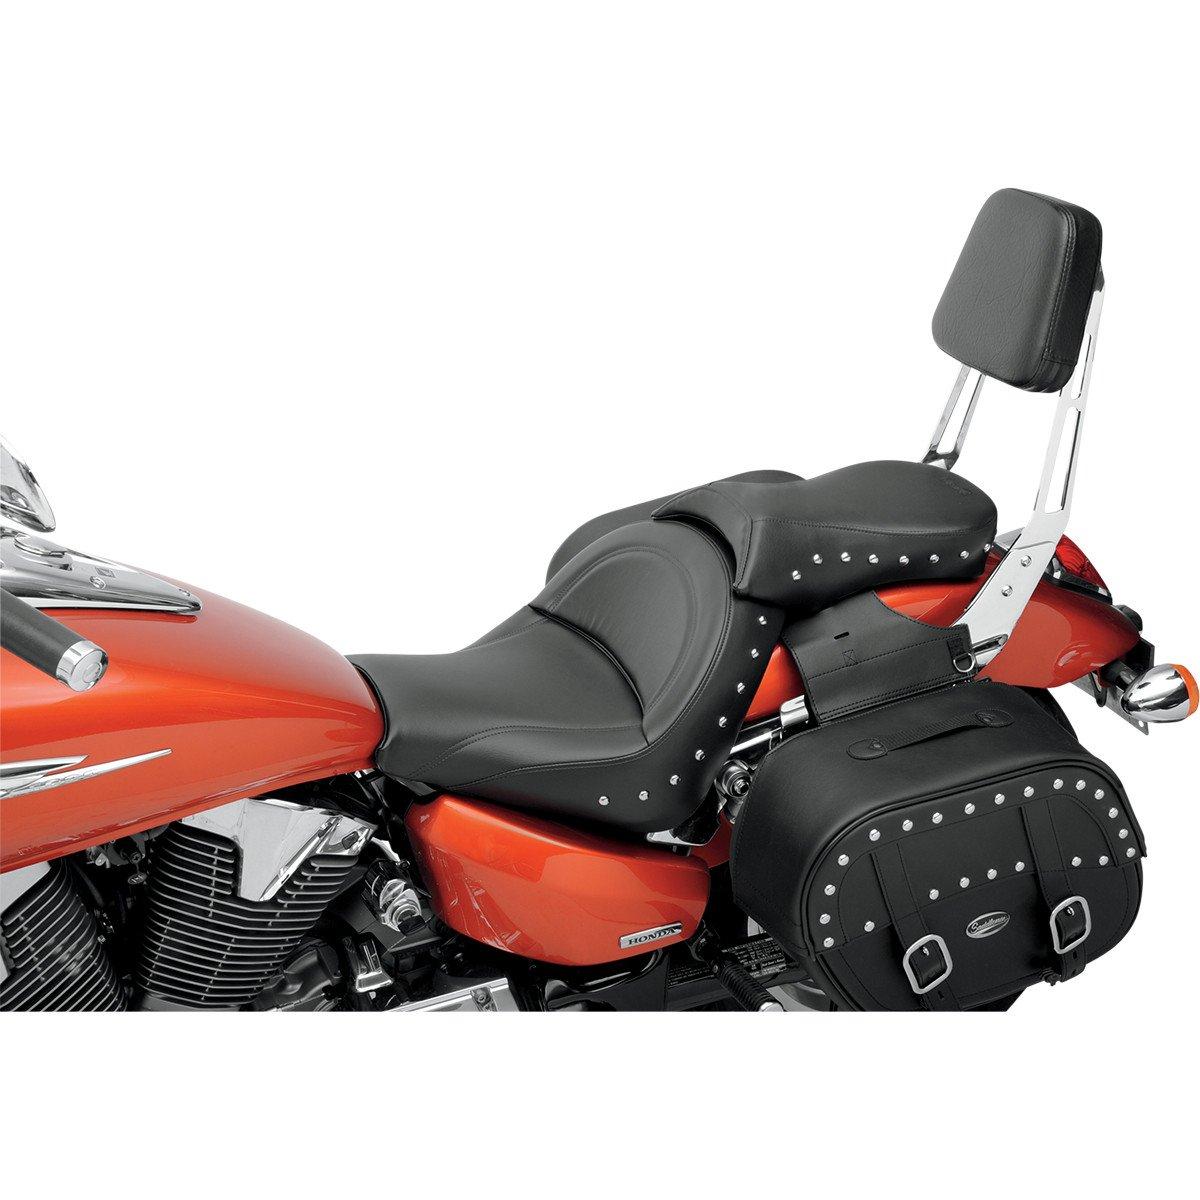 Saddlemen Sport Pillion Pad for Yamaha V-Star 1100 Classic